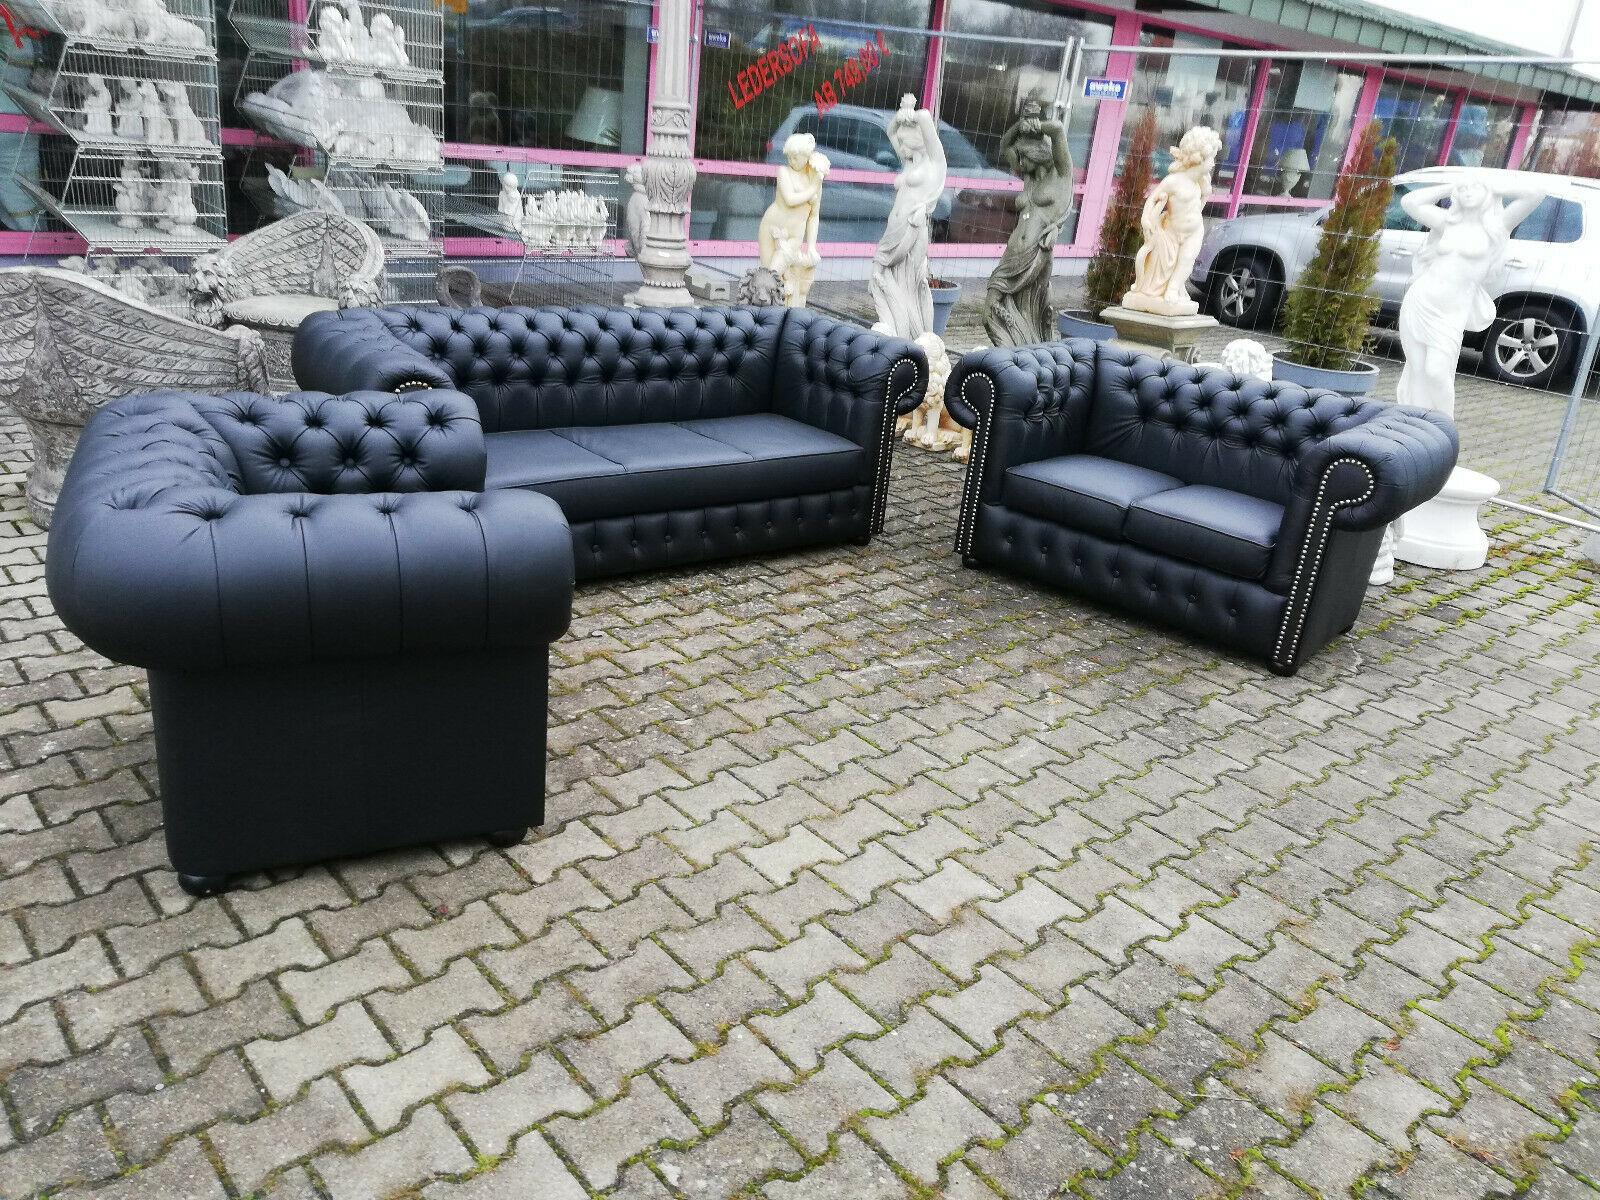 Full Size of Sofa Garnitur Moderne Garnituren 3 2 3 2 1 Couch Leder 3 2 1 Rundecke Gebraucht Teilig Billiger Echtleder Original Chesterfield Ledersofa Set Sitzer Gnstig Sofa Sofa Garnitur